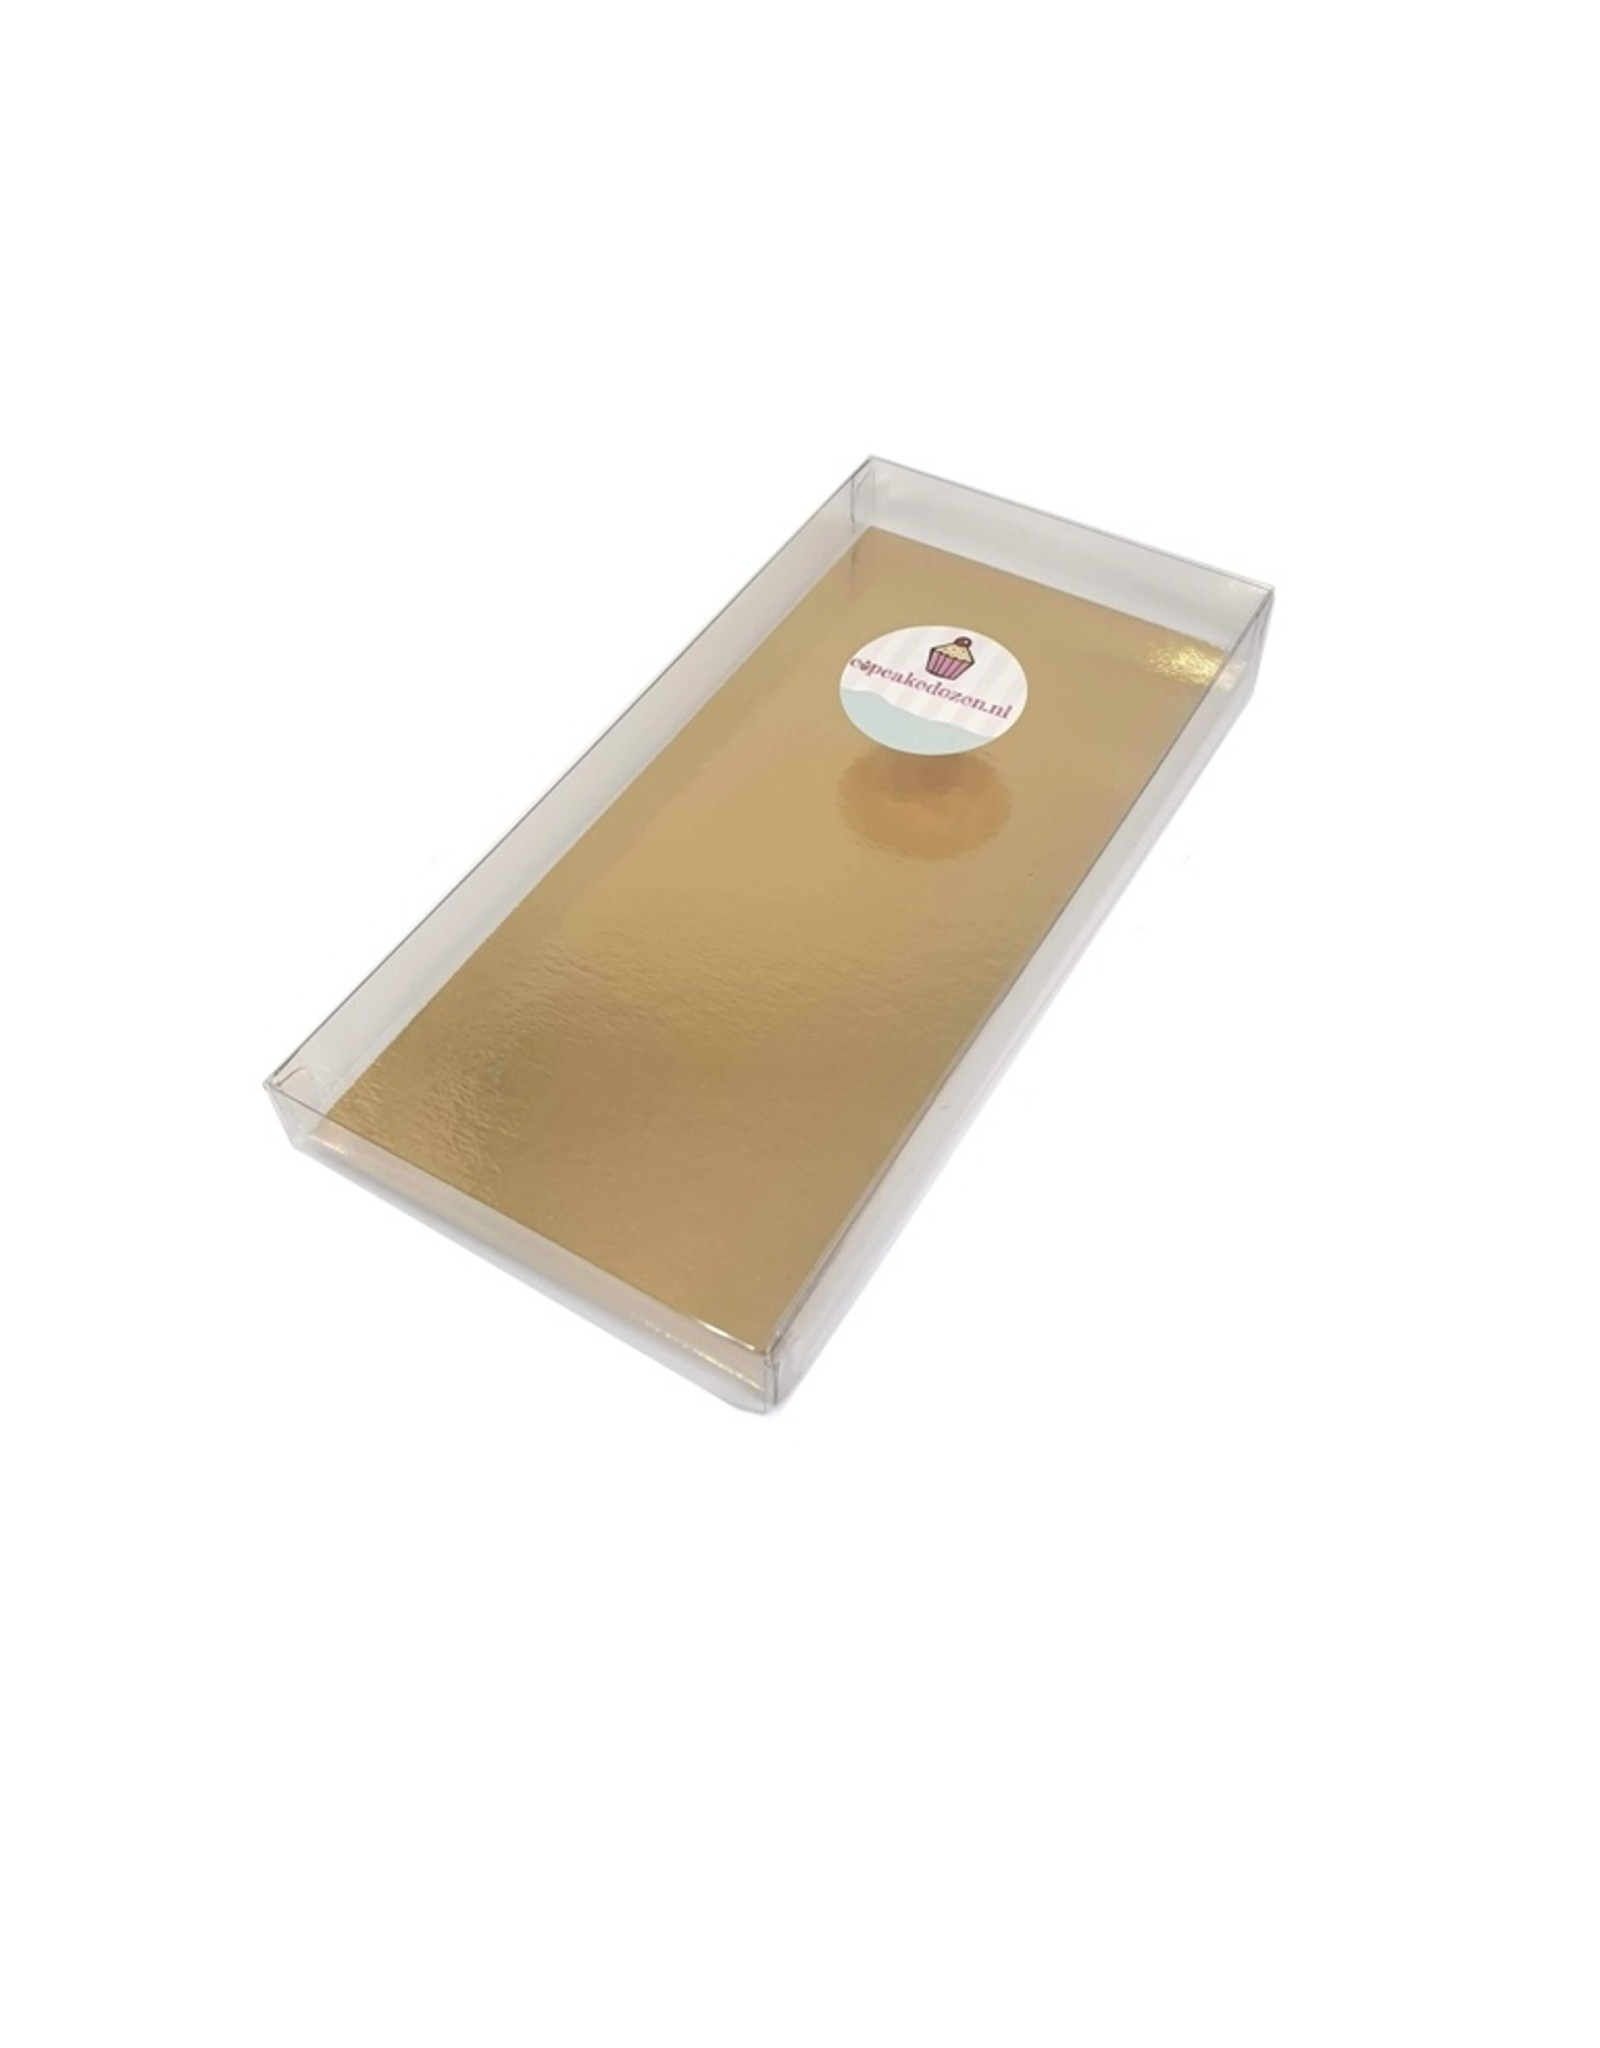 Transparante doos rechthoek - diverse maten (per 100 stuks)